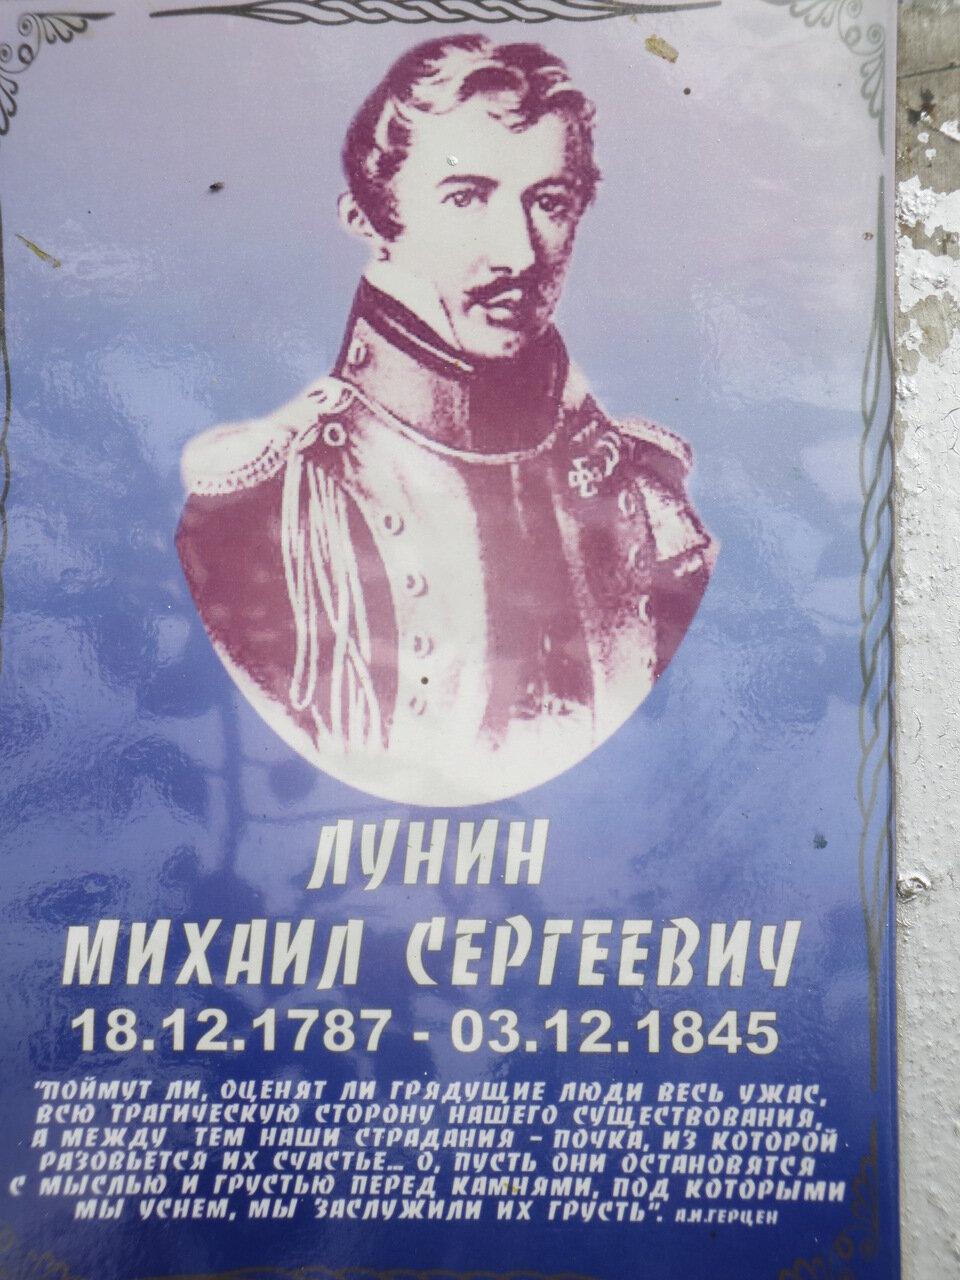 https://img-fotki.yandex.ru/get/6609/15645269.78/0_8c9ed_c3ebde01_XXXL.jpg